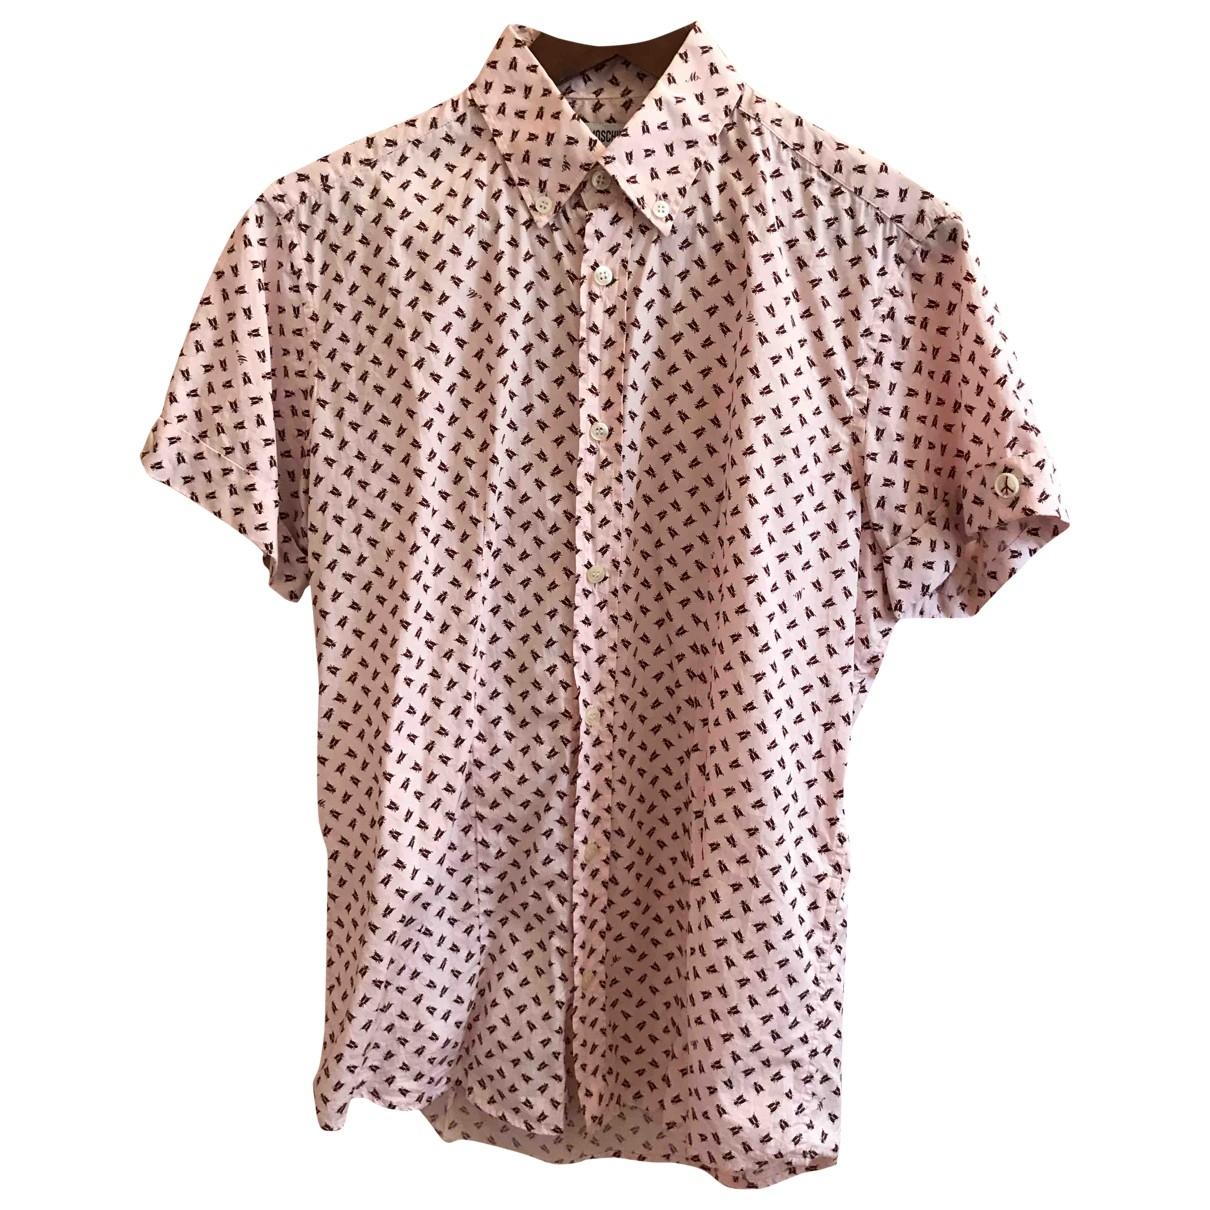 Moschino \N Pink Cotton Shirts for Men S International